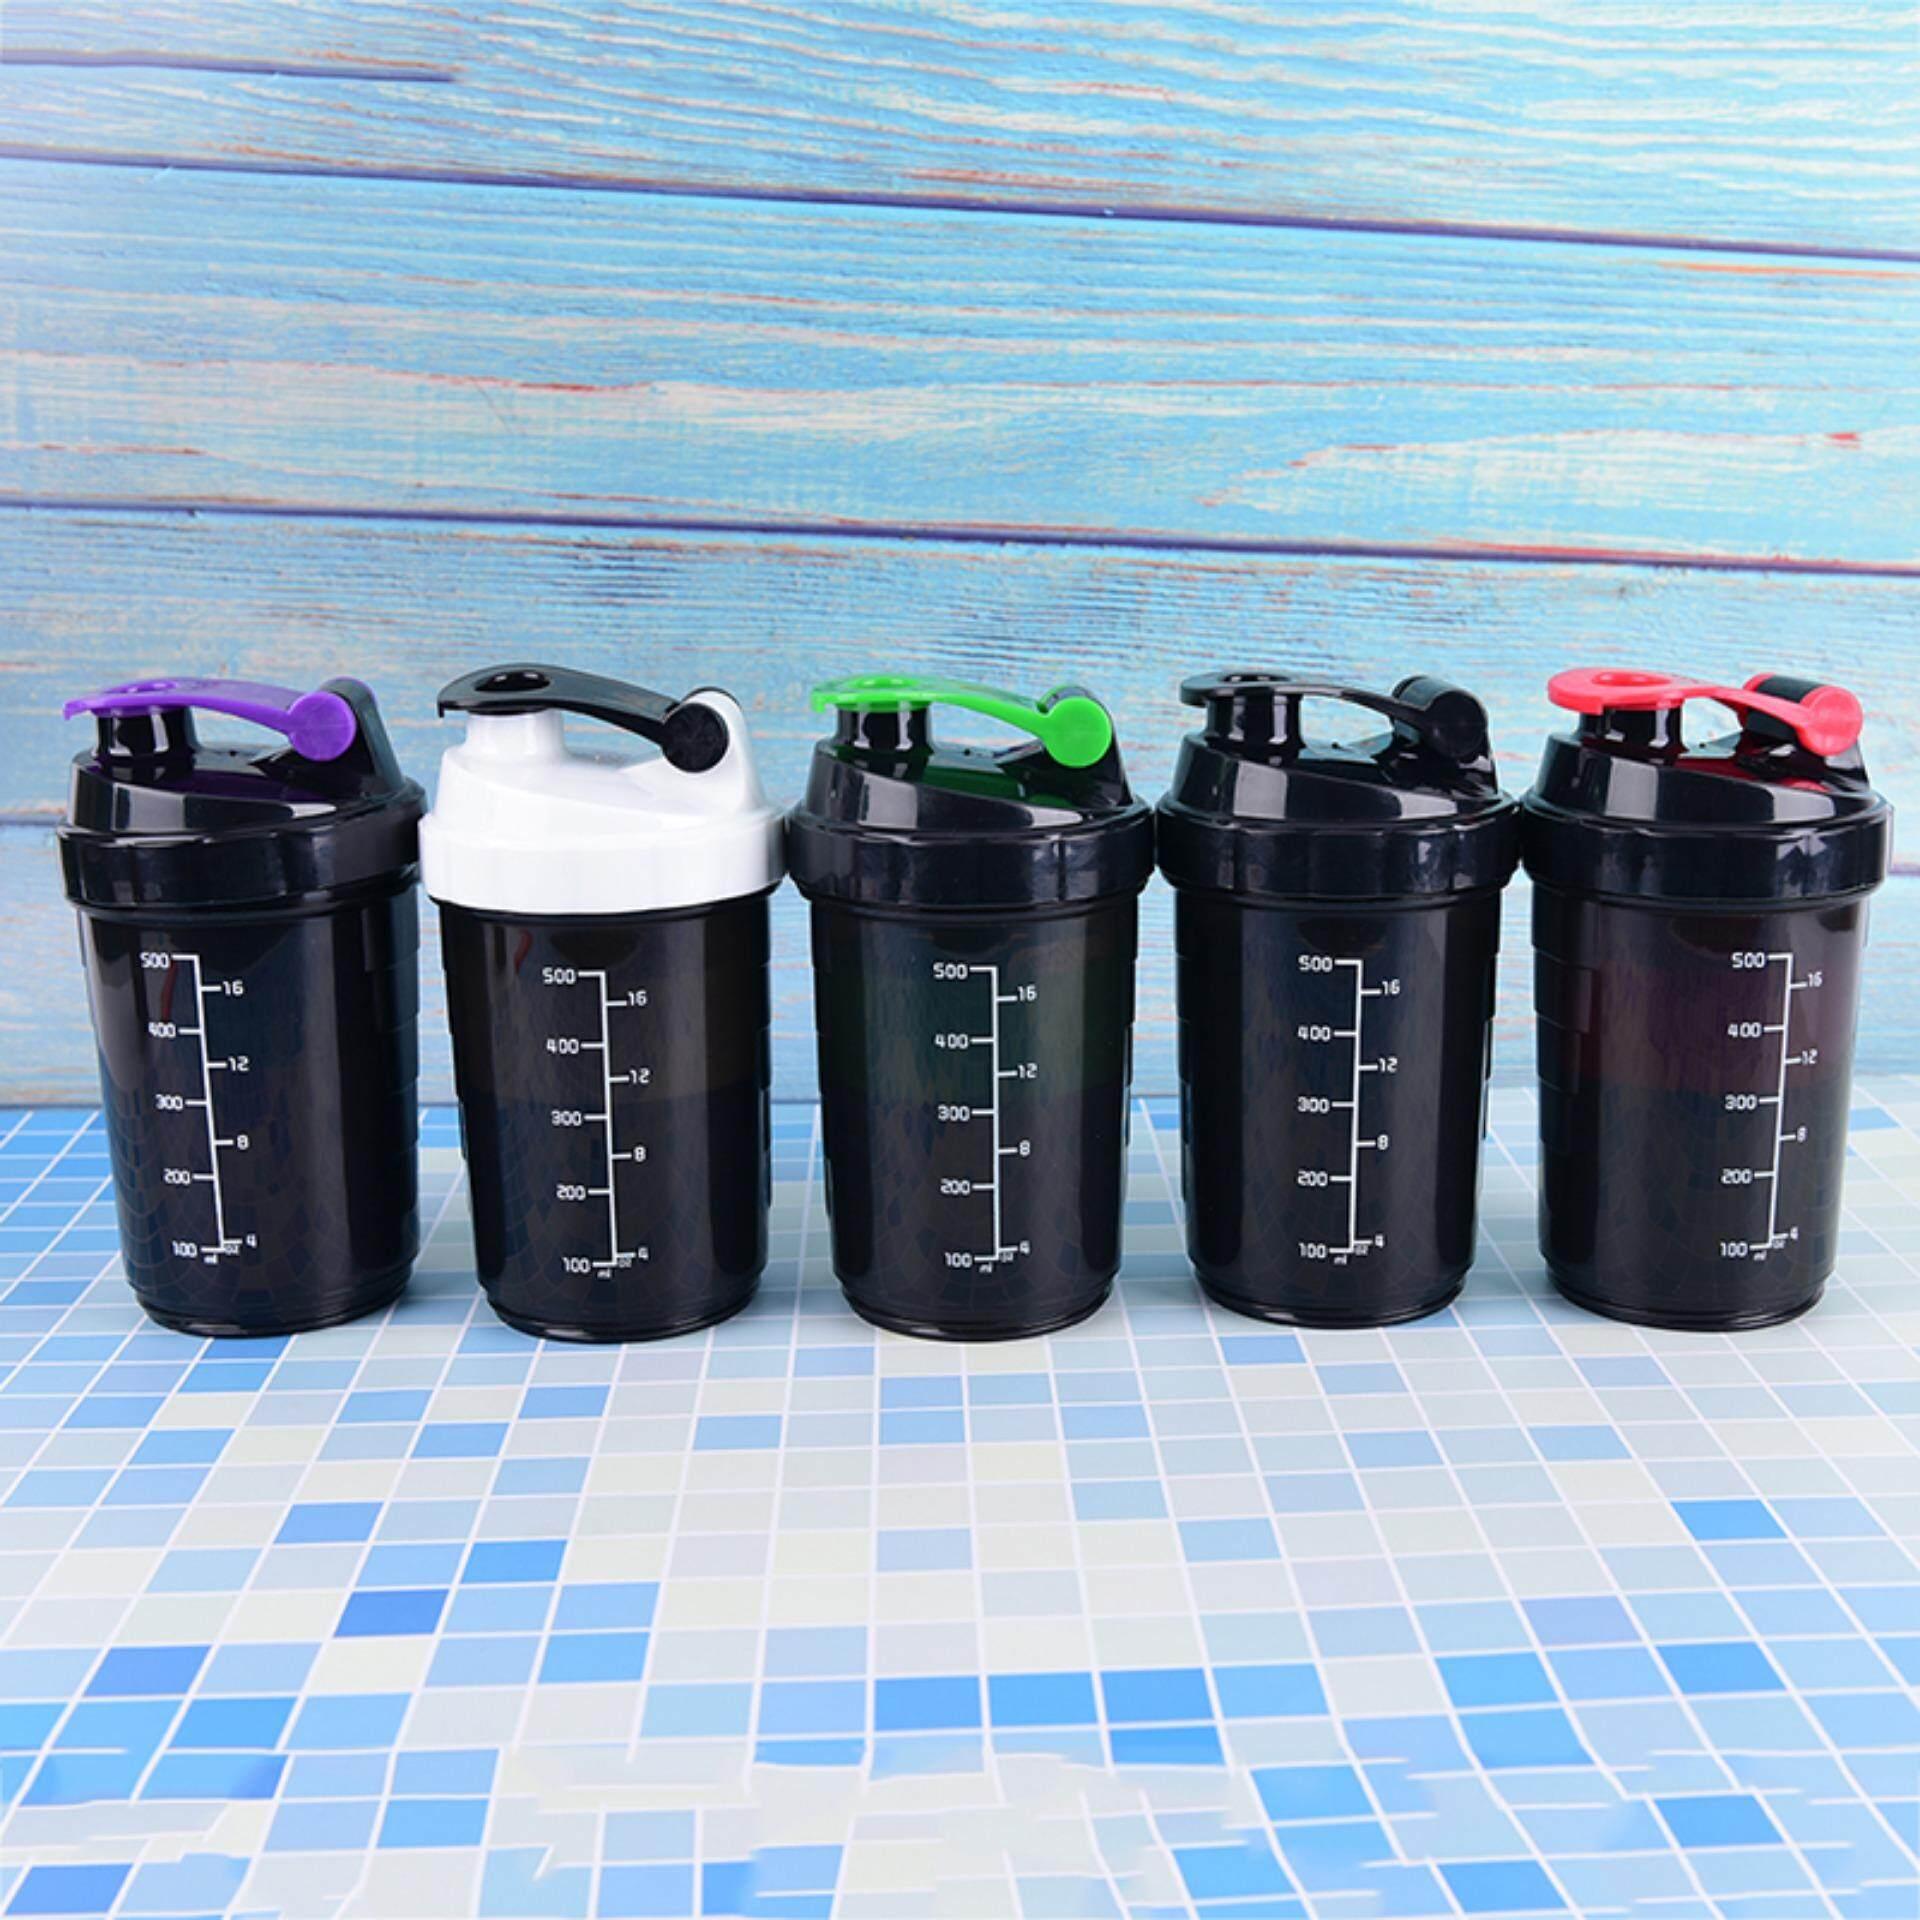 Gambar Produk Protein Powder Shake Bottle Mixing Bottle Fitness Protein Shaker Water Bottle Selengkapnya